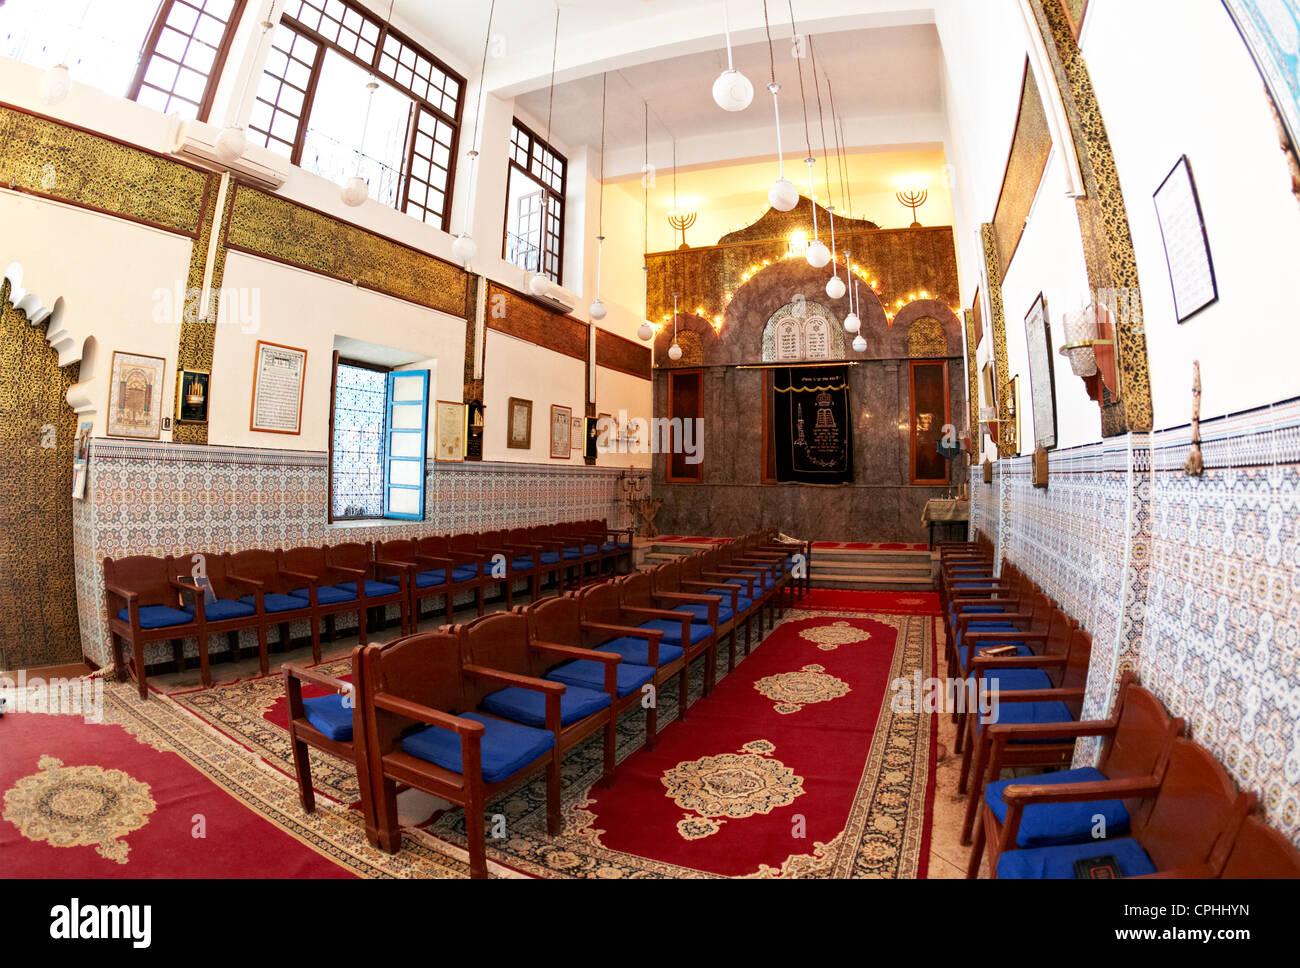 The Synagogue Marrakesh Morocco - Stock Image